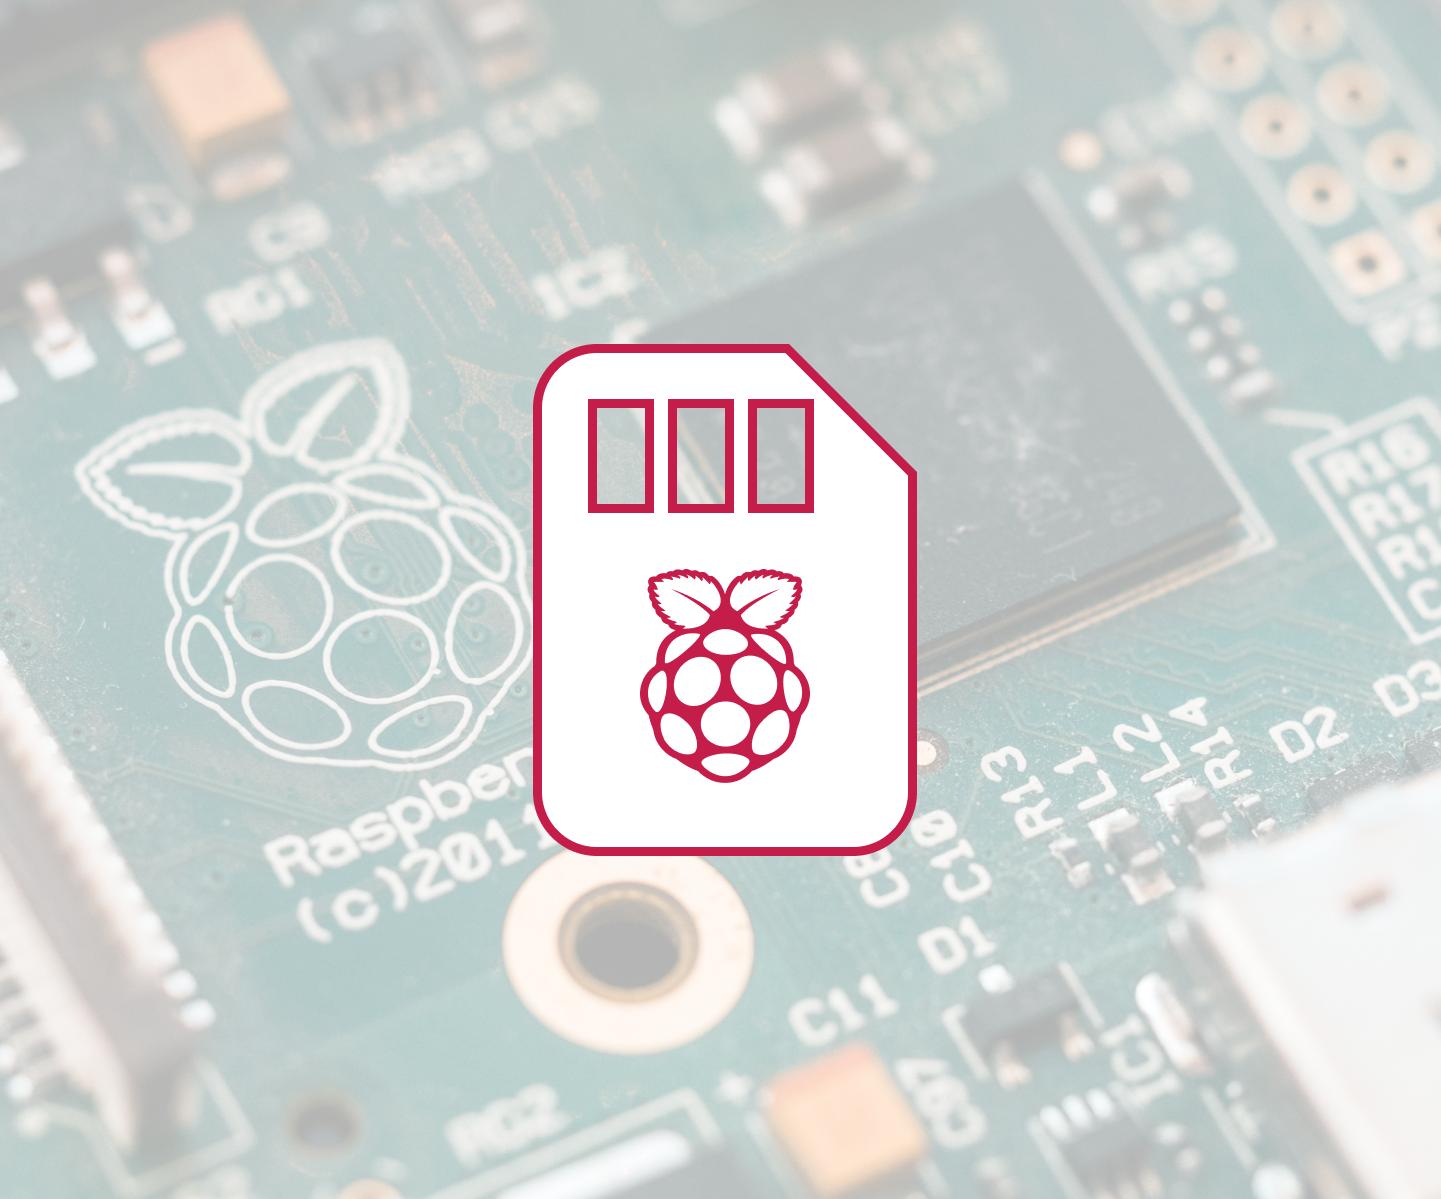 Install Raspbian on Your Raspberry Pi